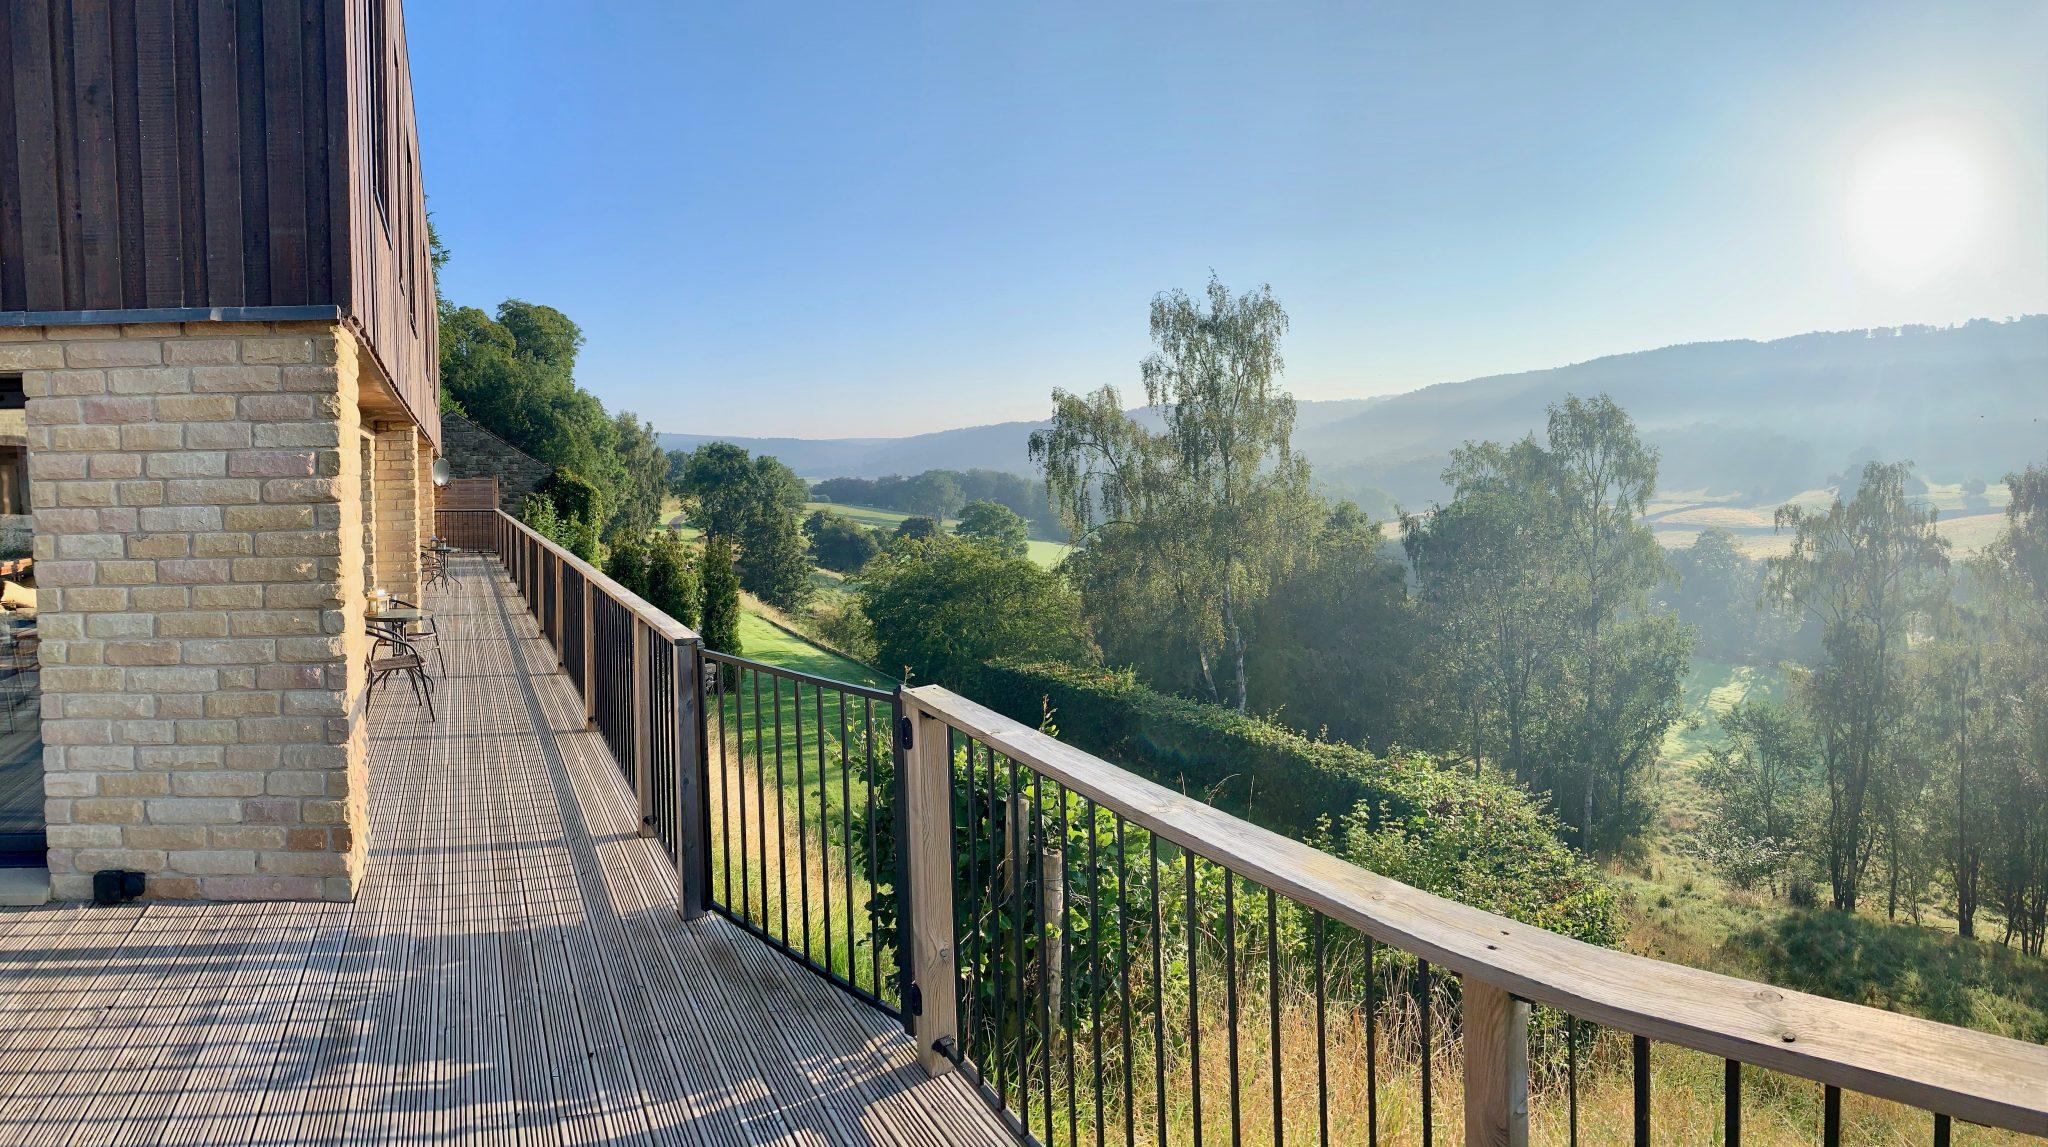 Peak District yoga and Hiking weekend